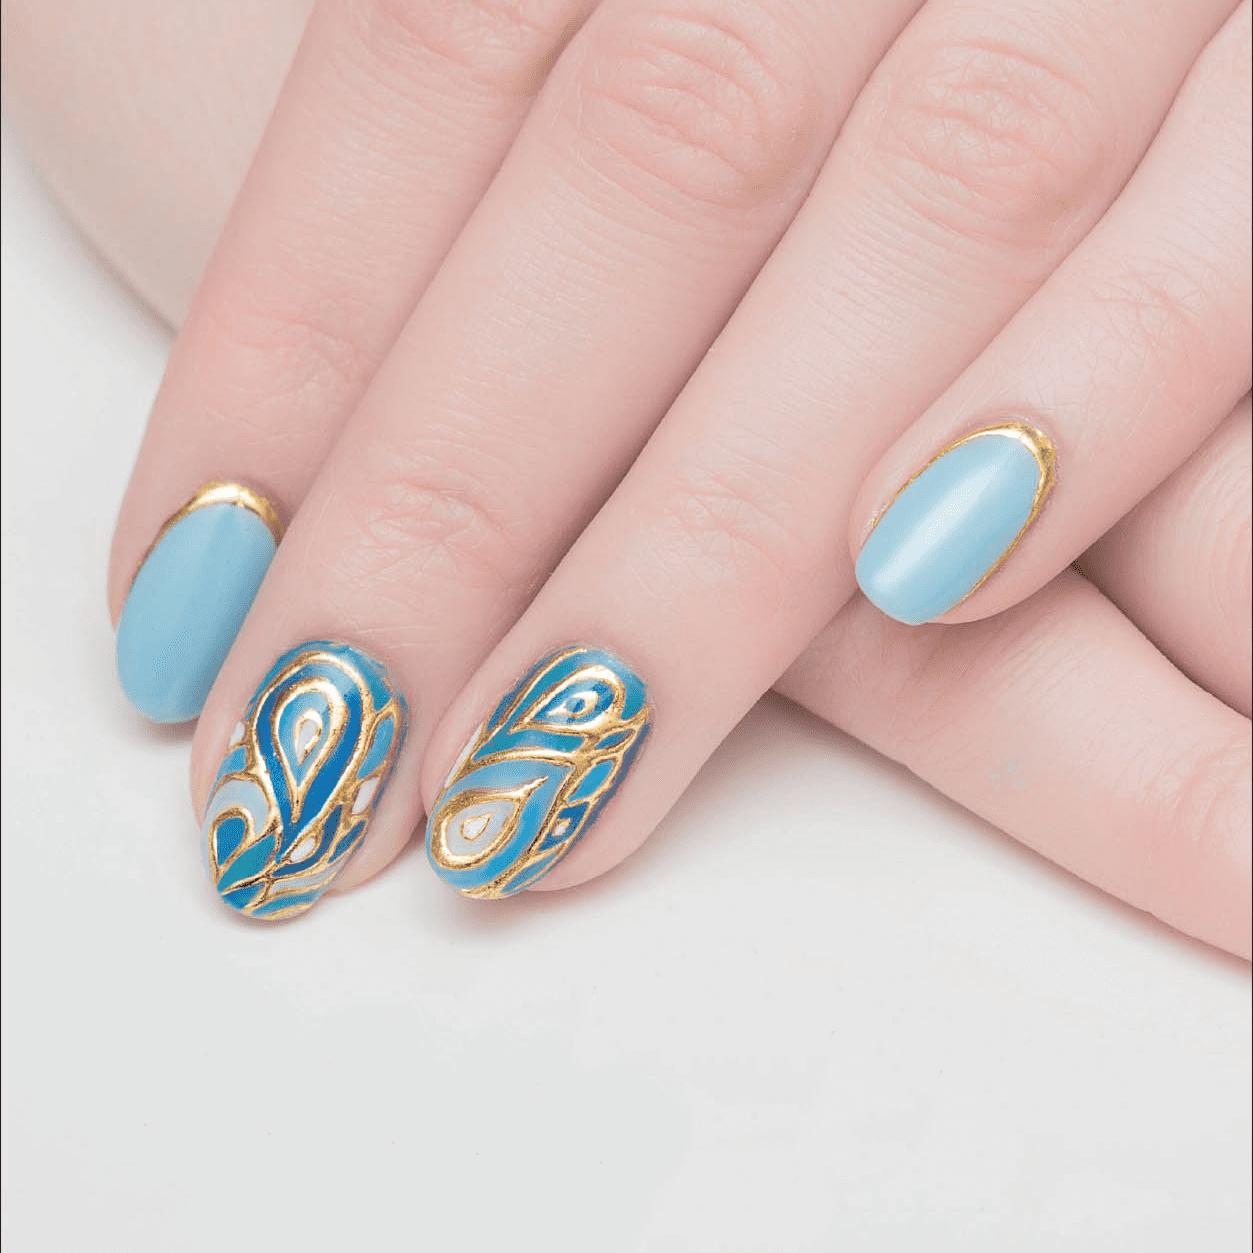 Classic Manicure + Classic Pedicure (1 Session)